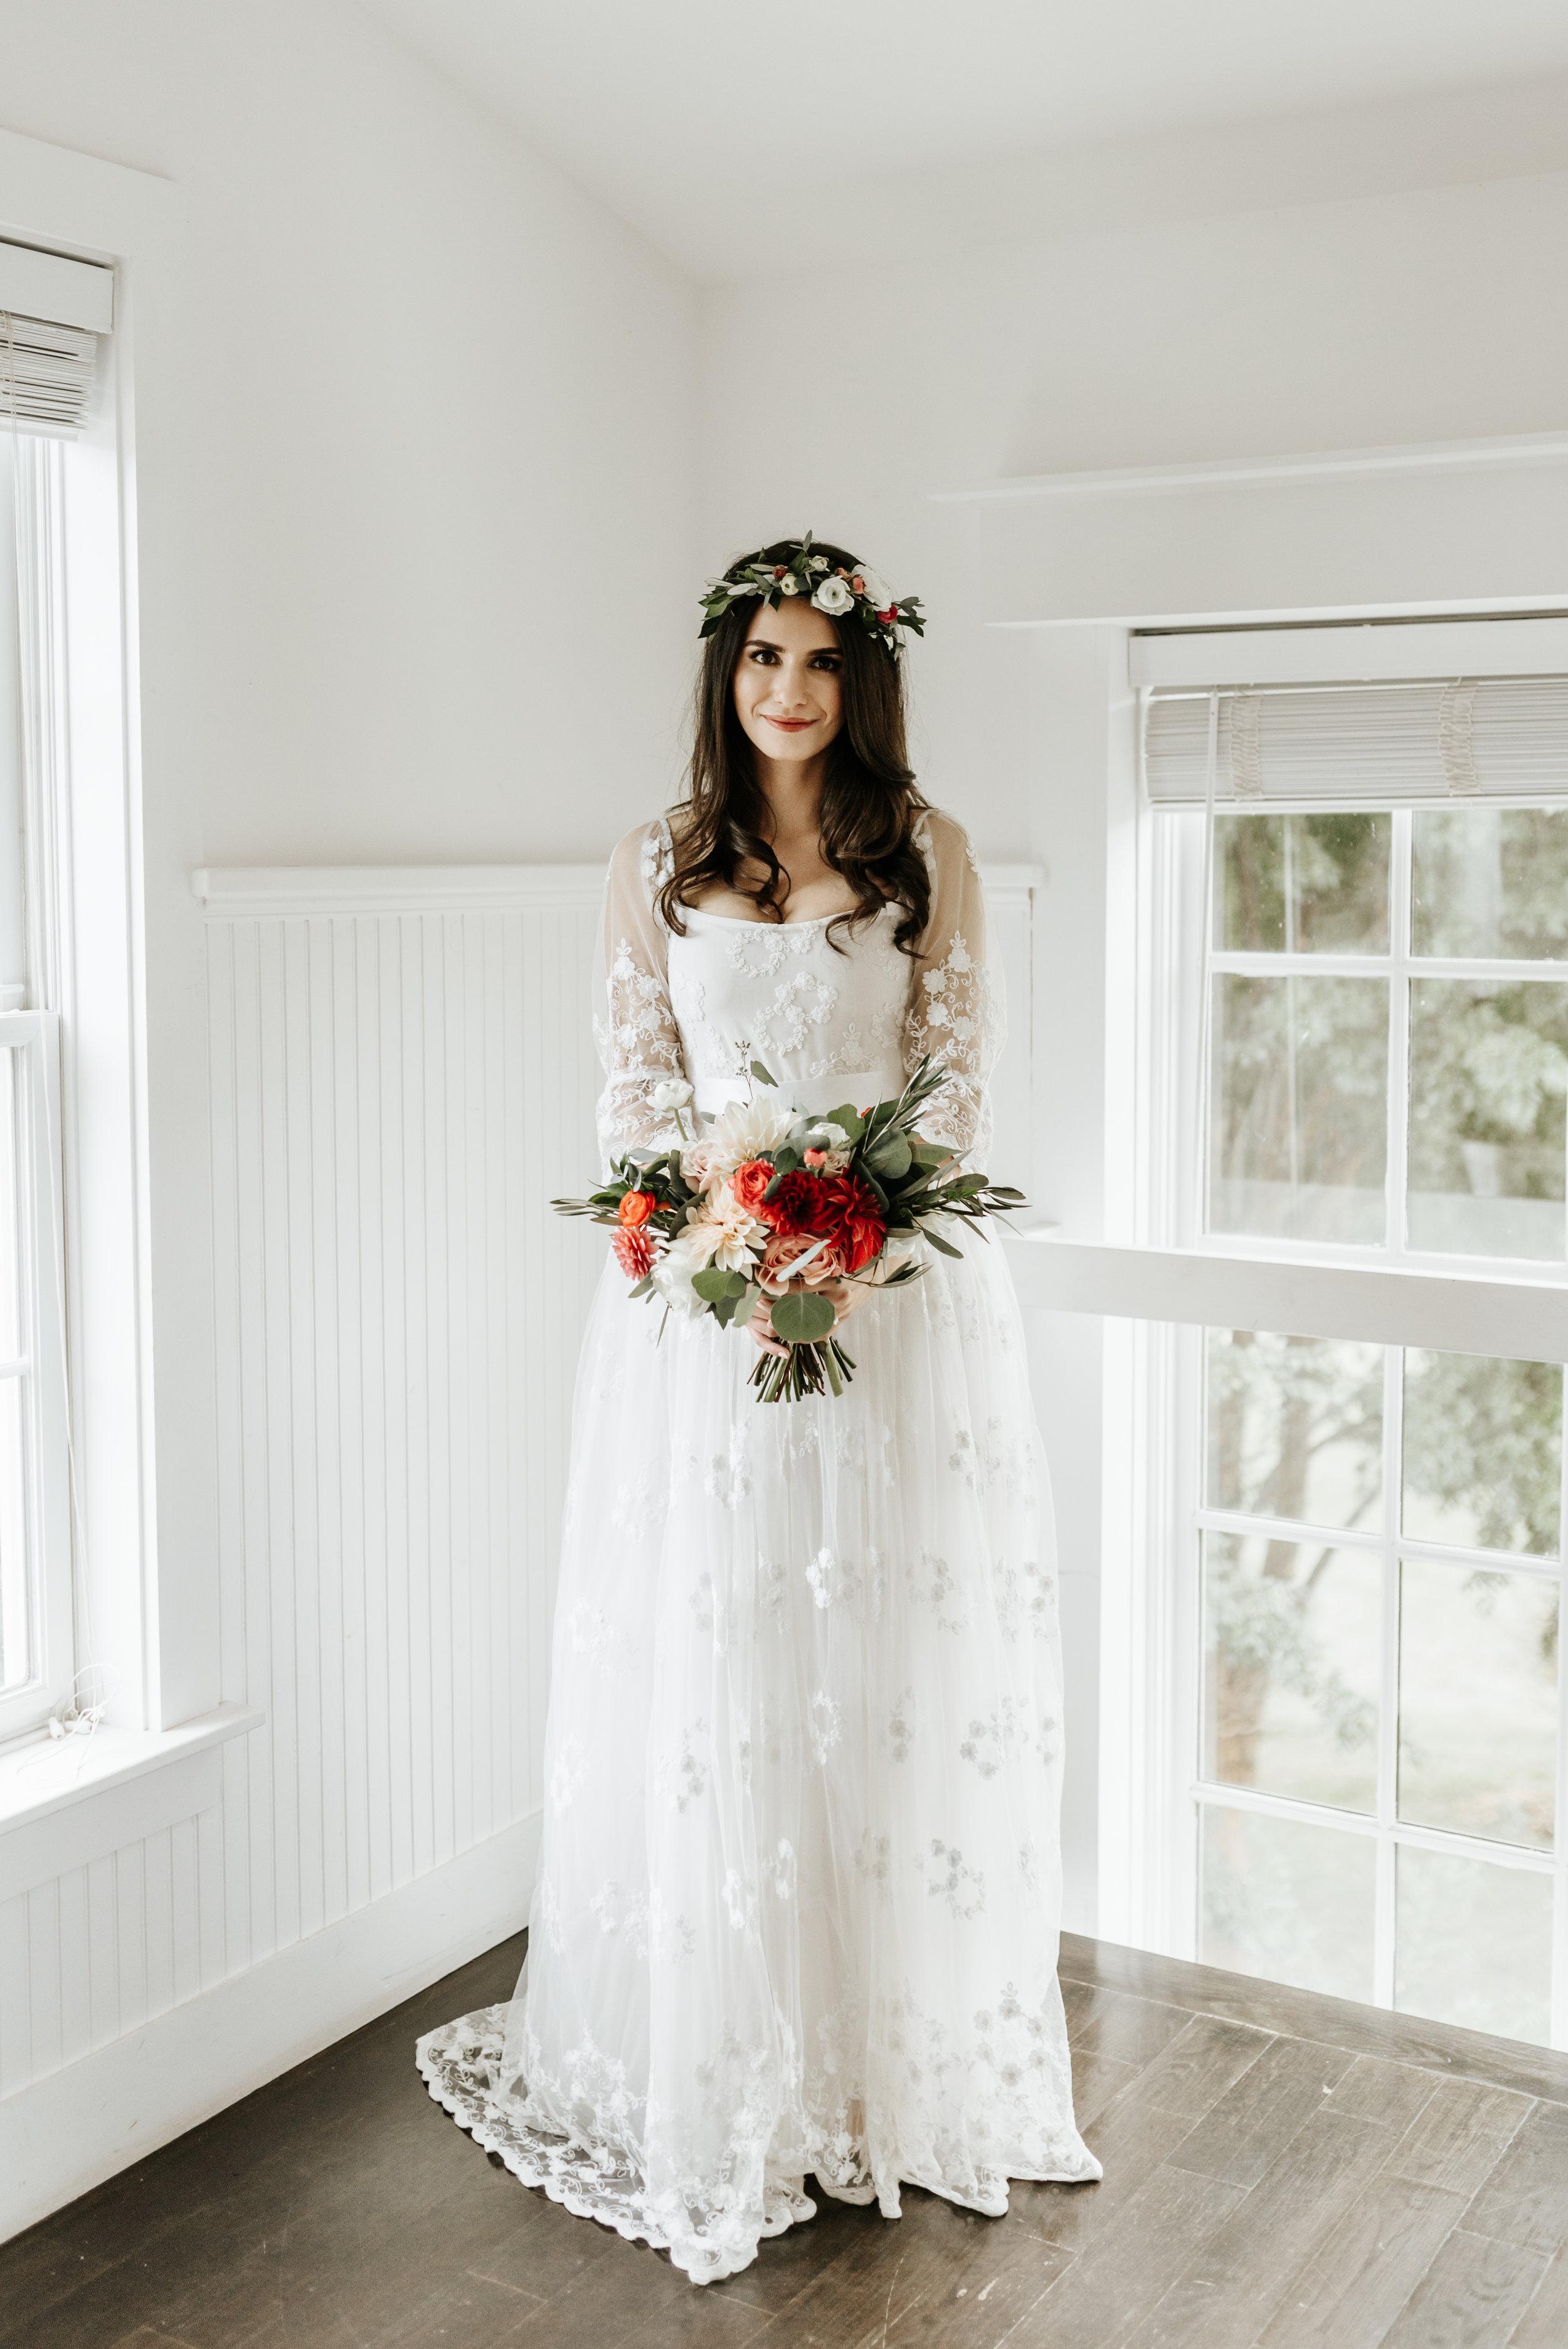 Veritas-Vineyards-and-Winery-Wedding-Photography-Afton-Virginia-Yasmin-Seth-Photography-by-V-9170.jpg